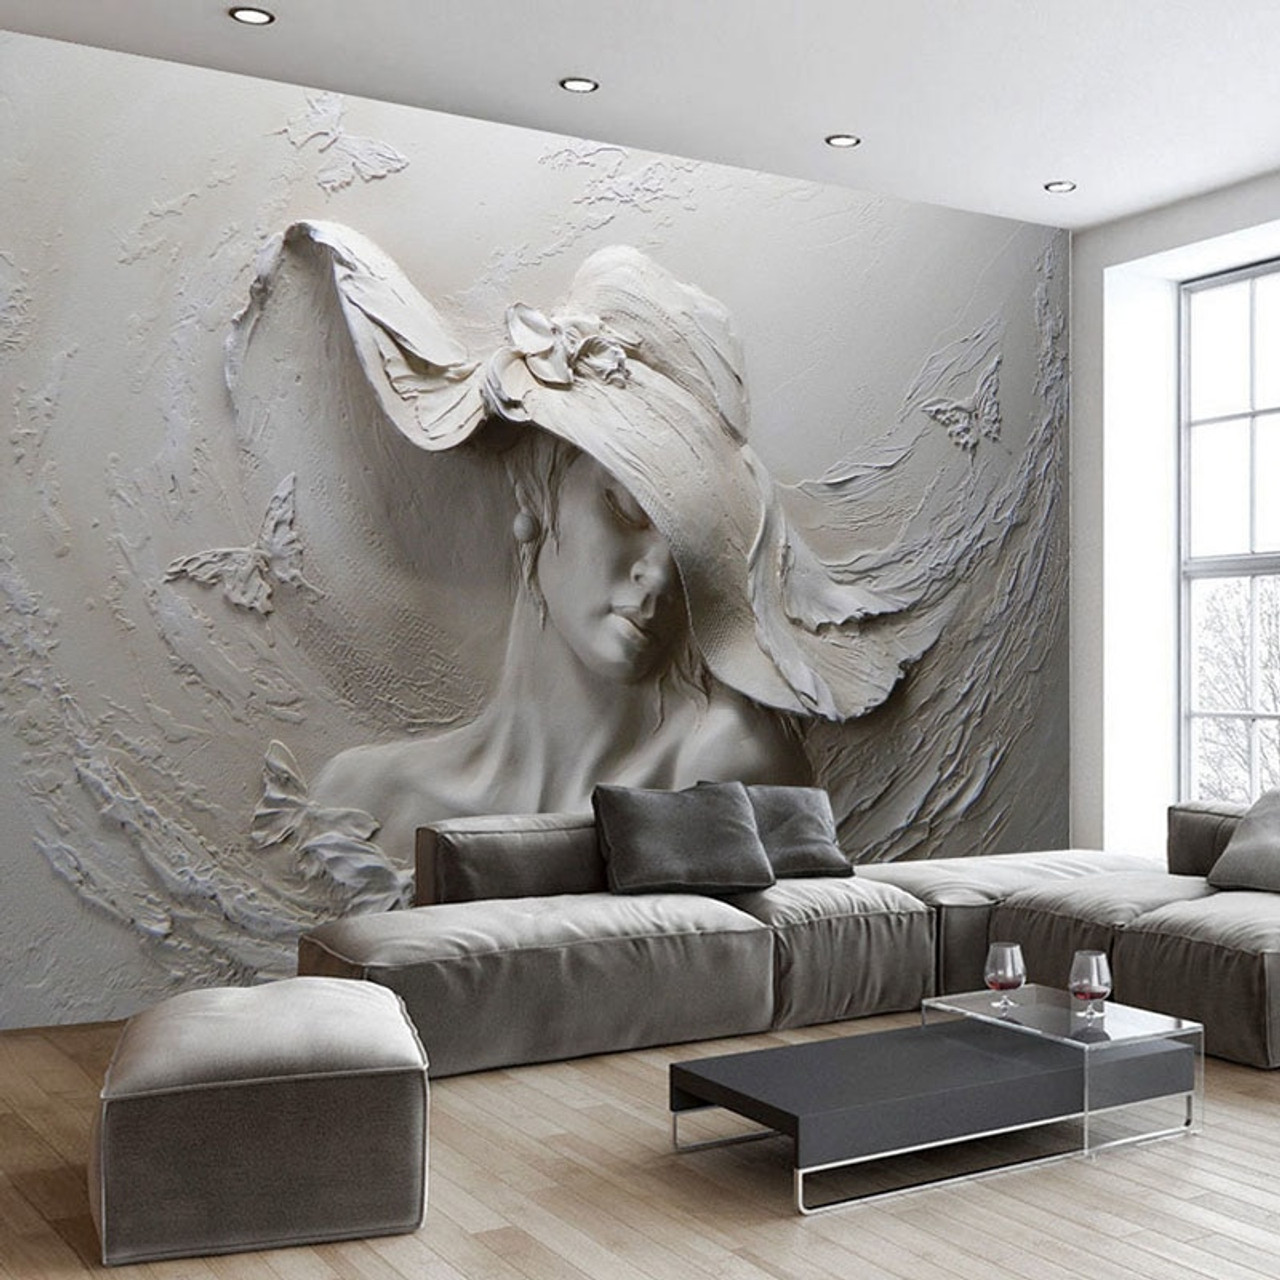 Custom Wallpaper 3d Stereoscopic Embossed Gray Beauty Oil Painting